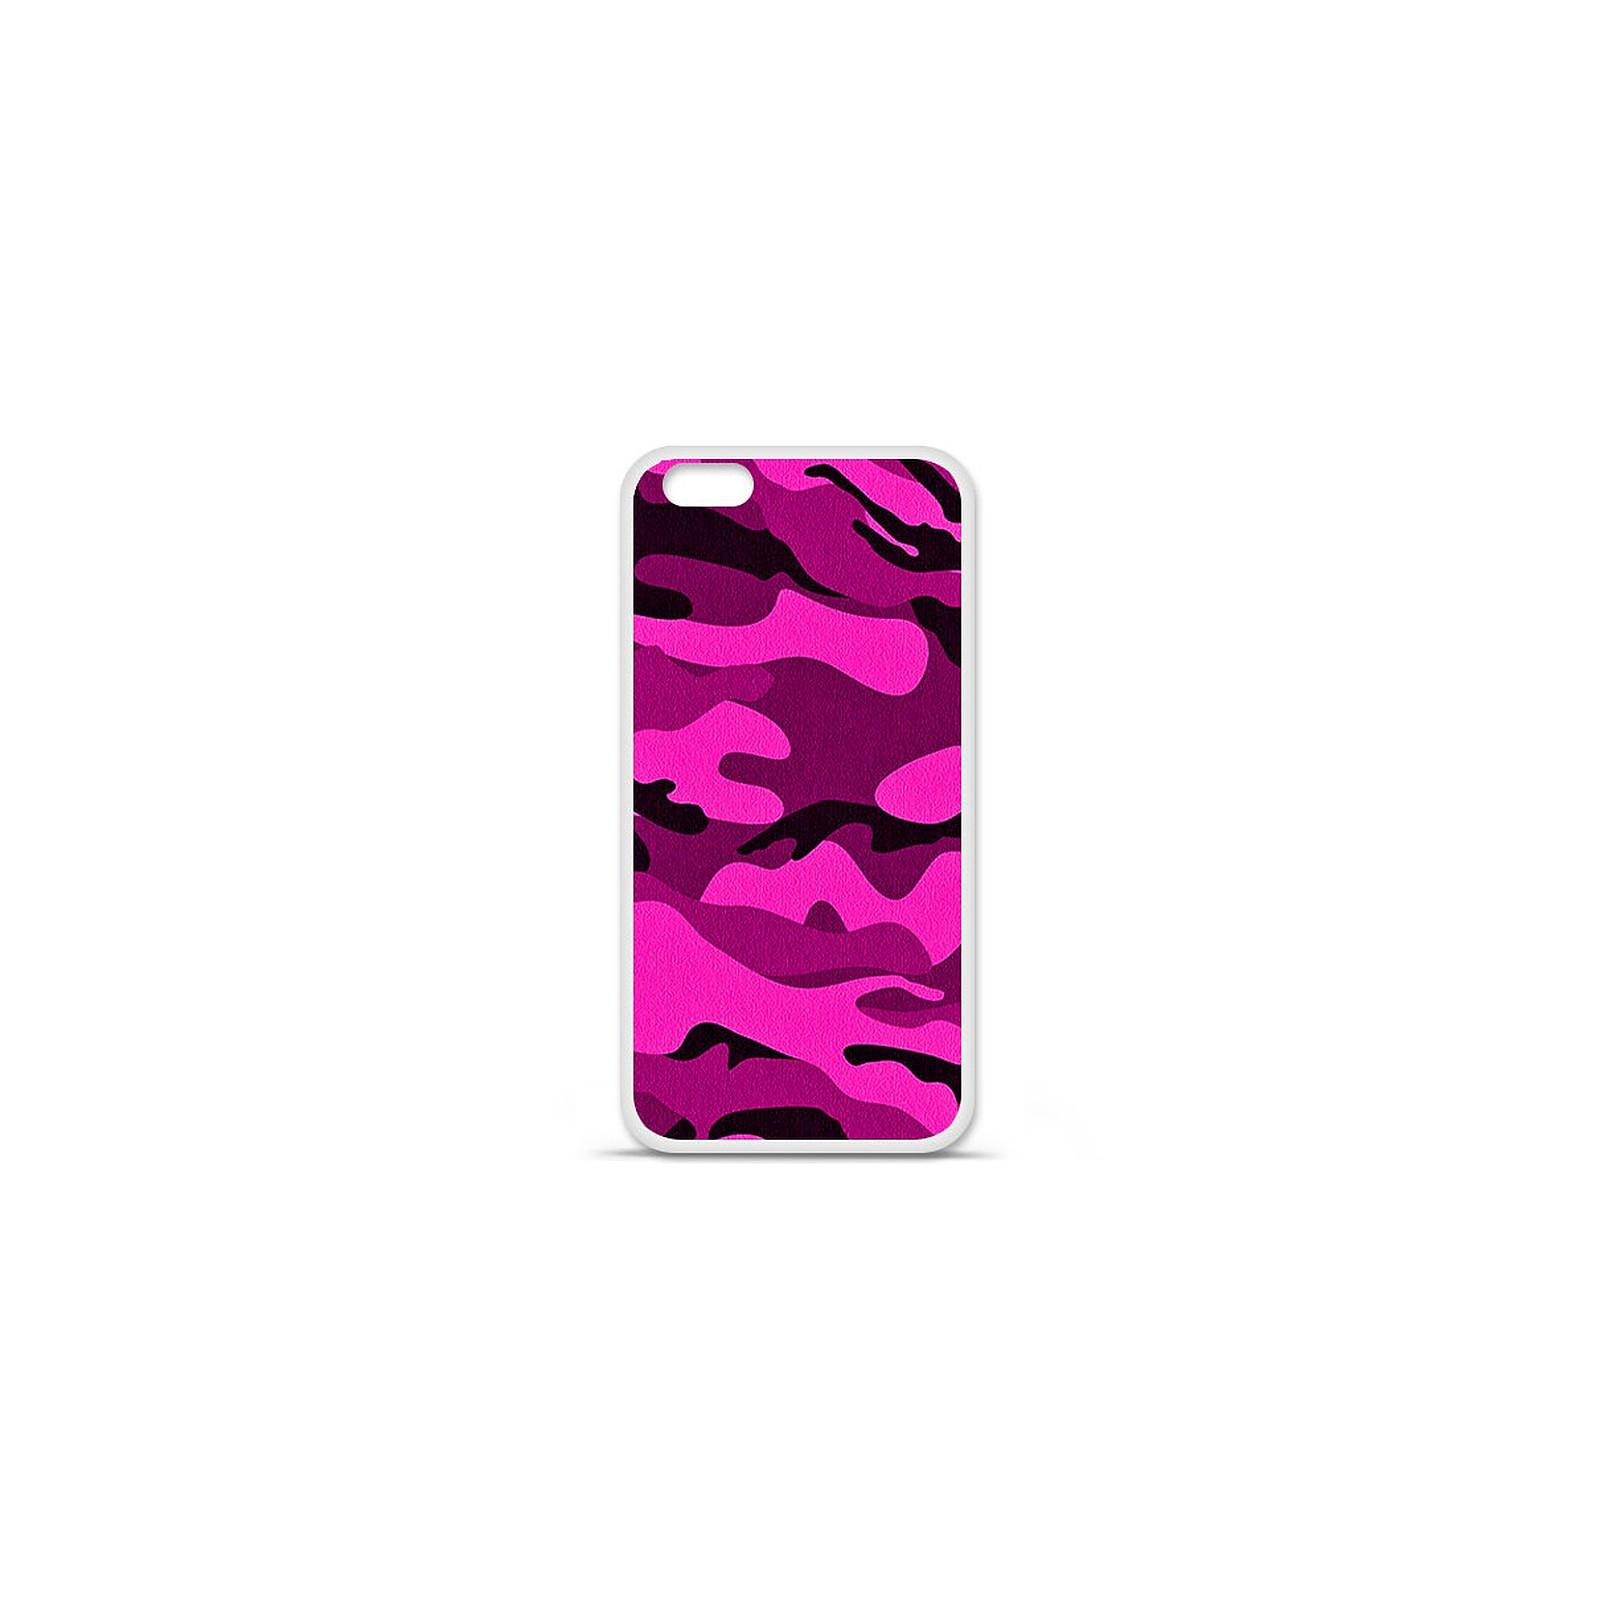 1001 Coques Coque silicone gel Apple IPhone 7 Plus motif Camouflage rose